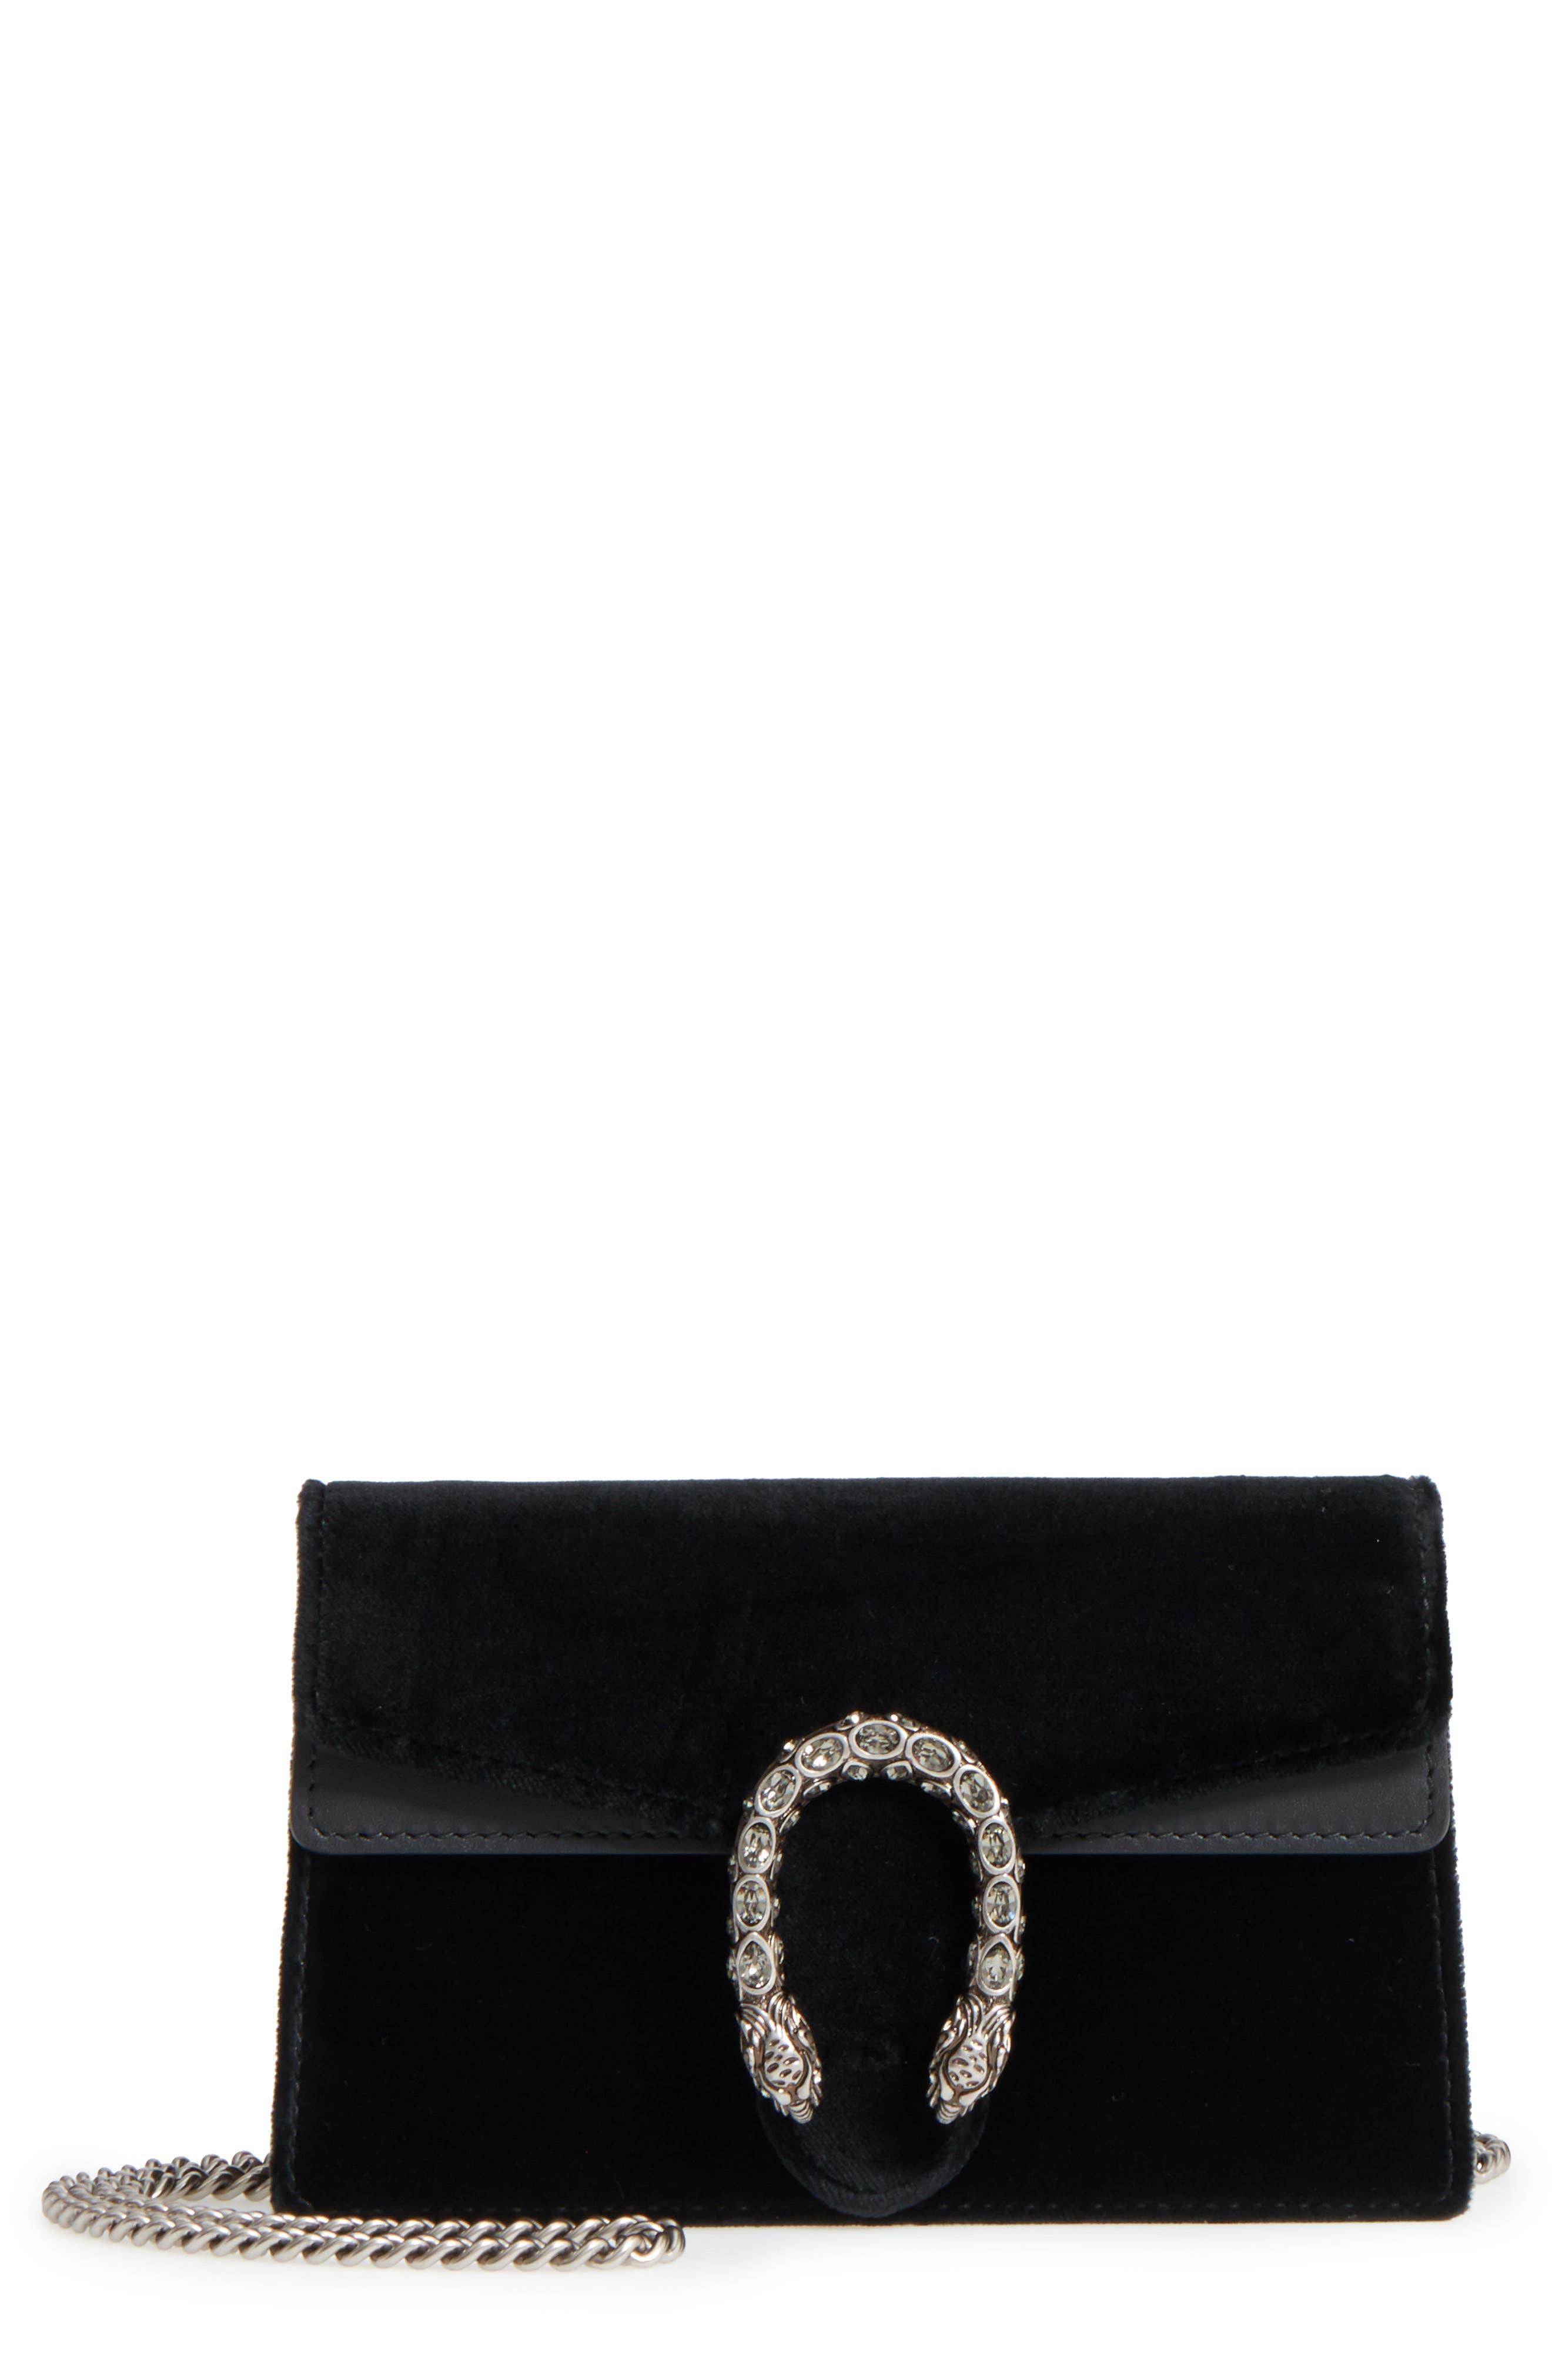 GUCCI, Super Mini Dionysus Velvet Shoulder Bag, Main thumbnail 1, color, NERO